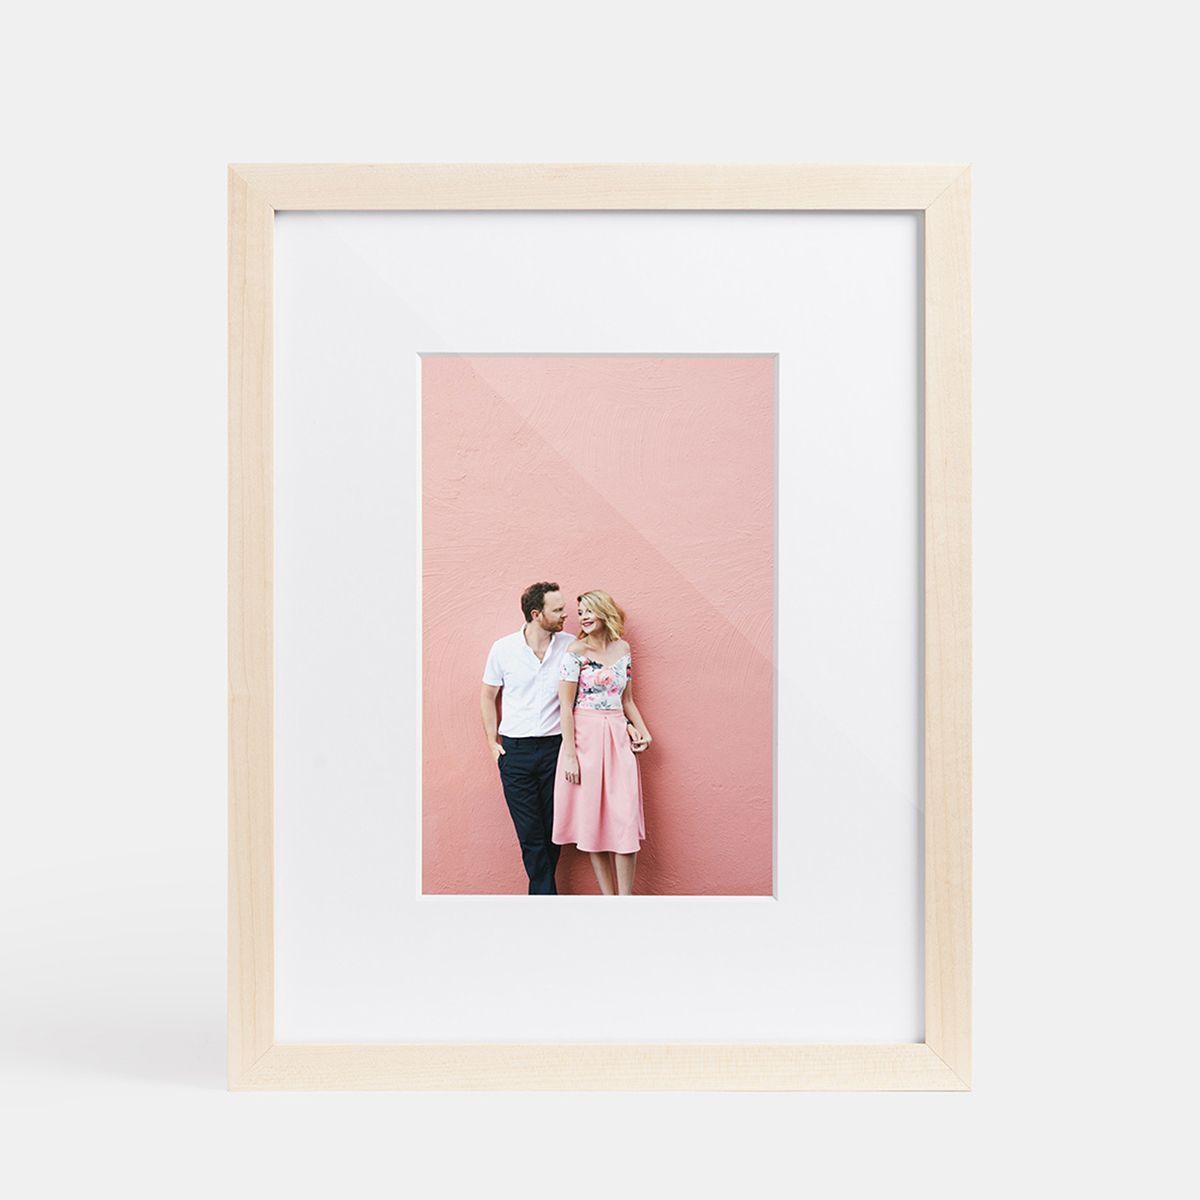 Gallery Frames | crafty | Gallery frames, Gallery wall ...